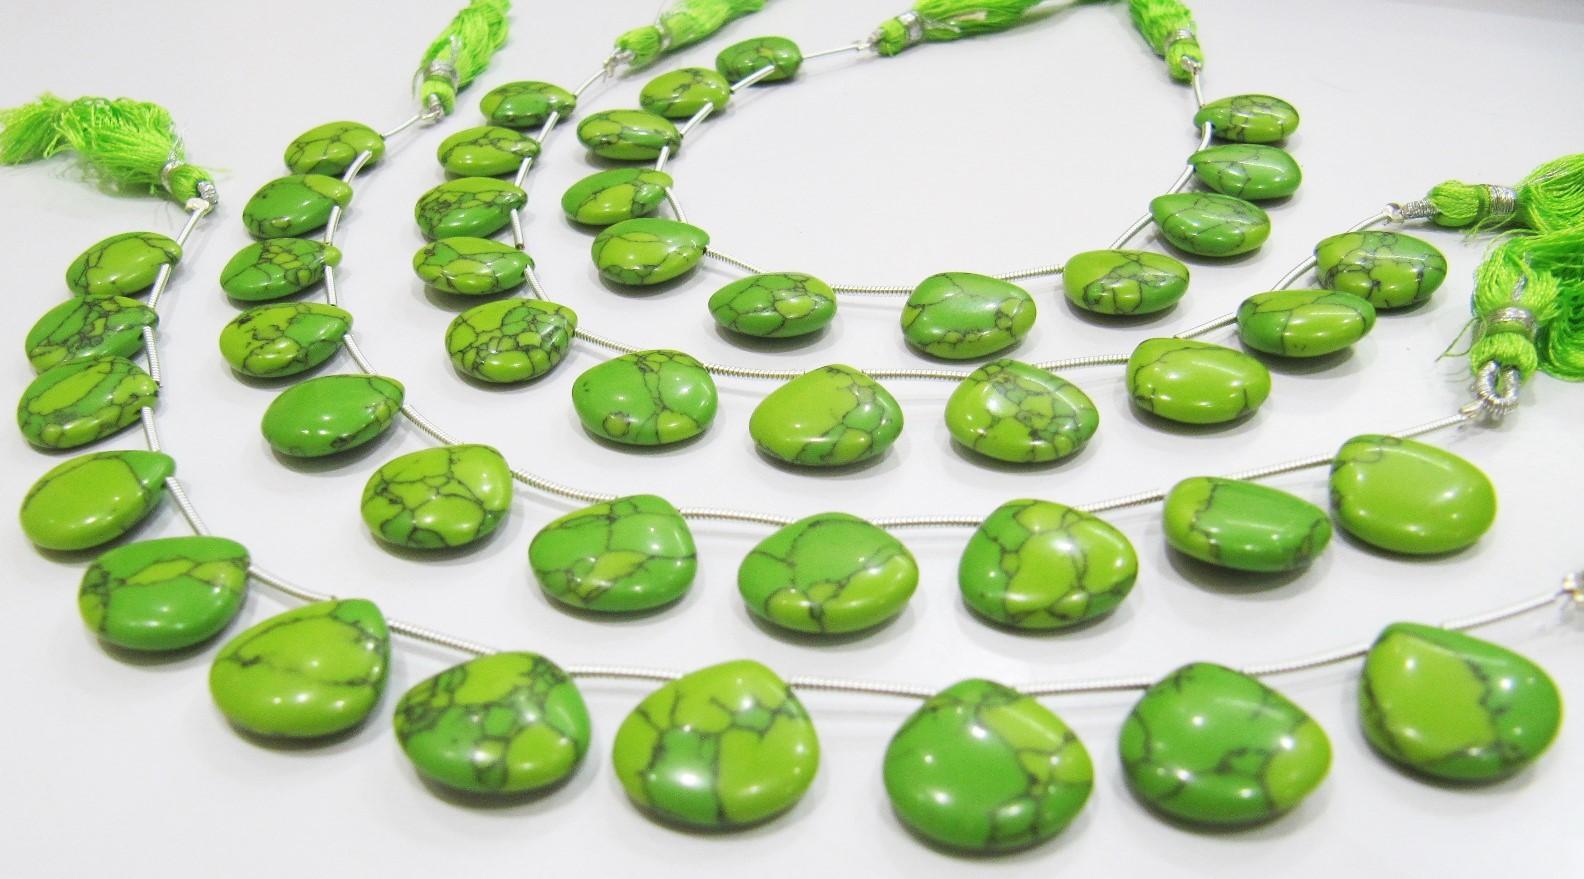 AAA Quality Green Turquoise Smooth Plain Heart Shape Beads.